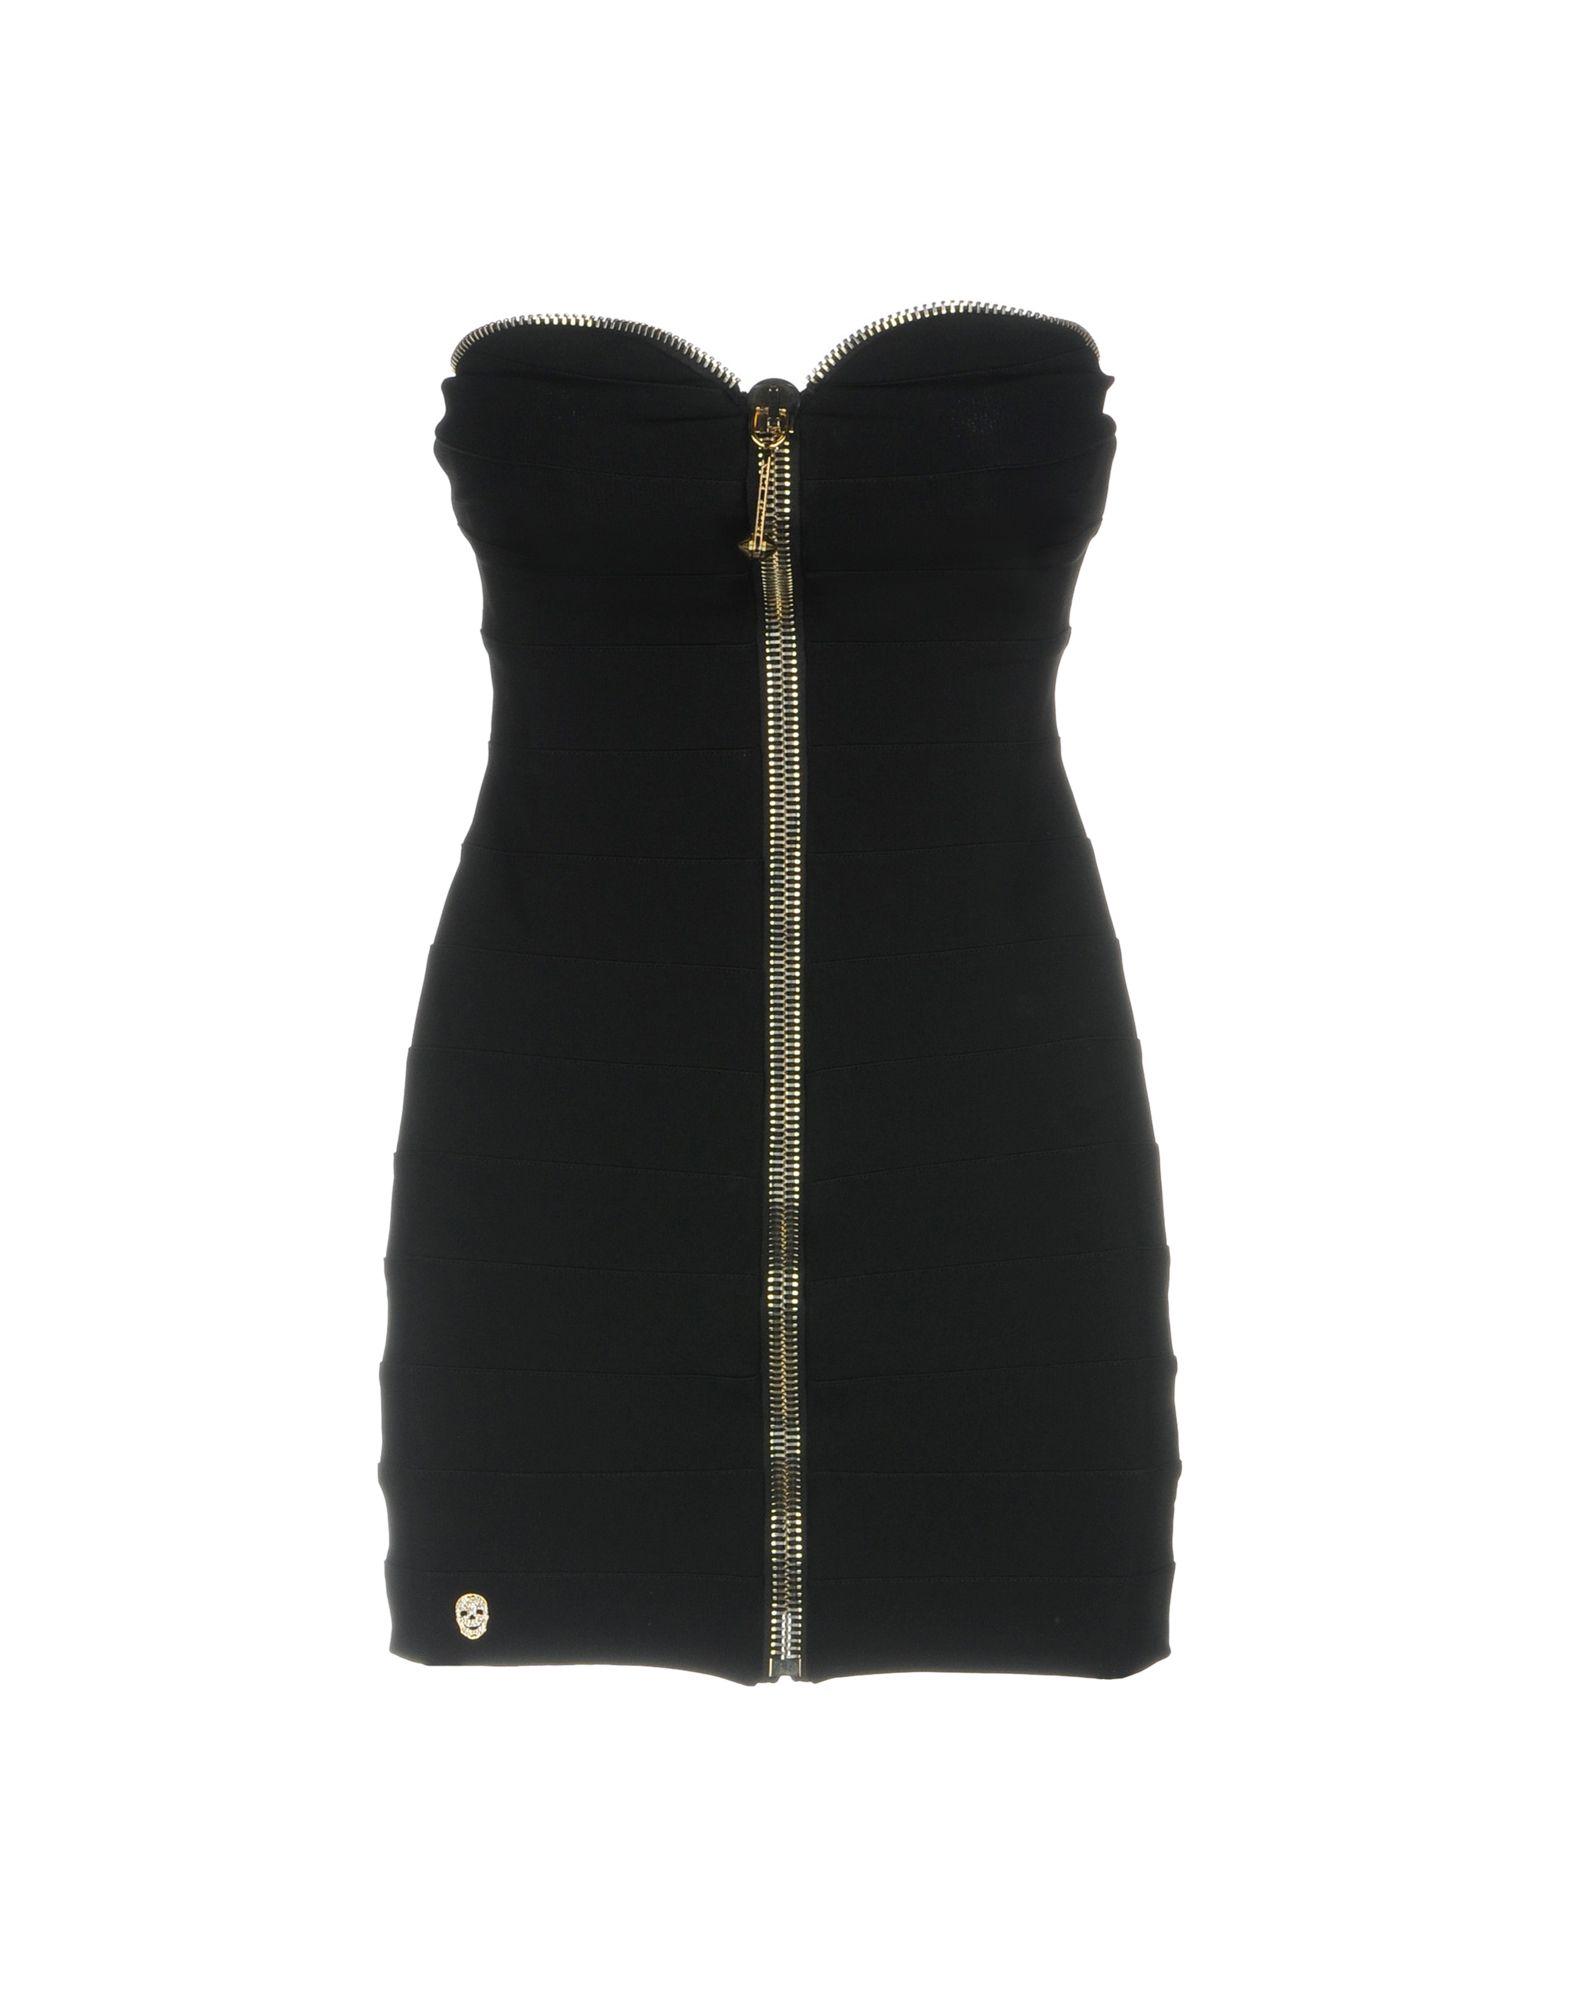 8b4dccb2eb5 Philipp Plein Short Dress - Women Philipp Plein Short Dresses online ...